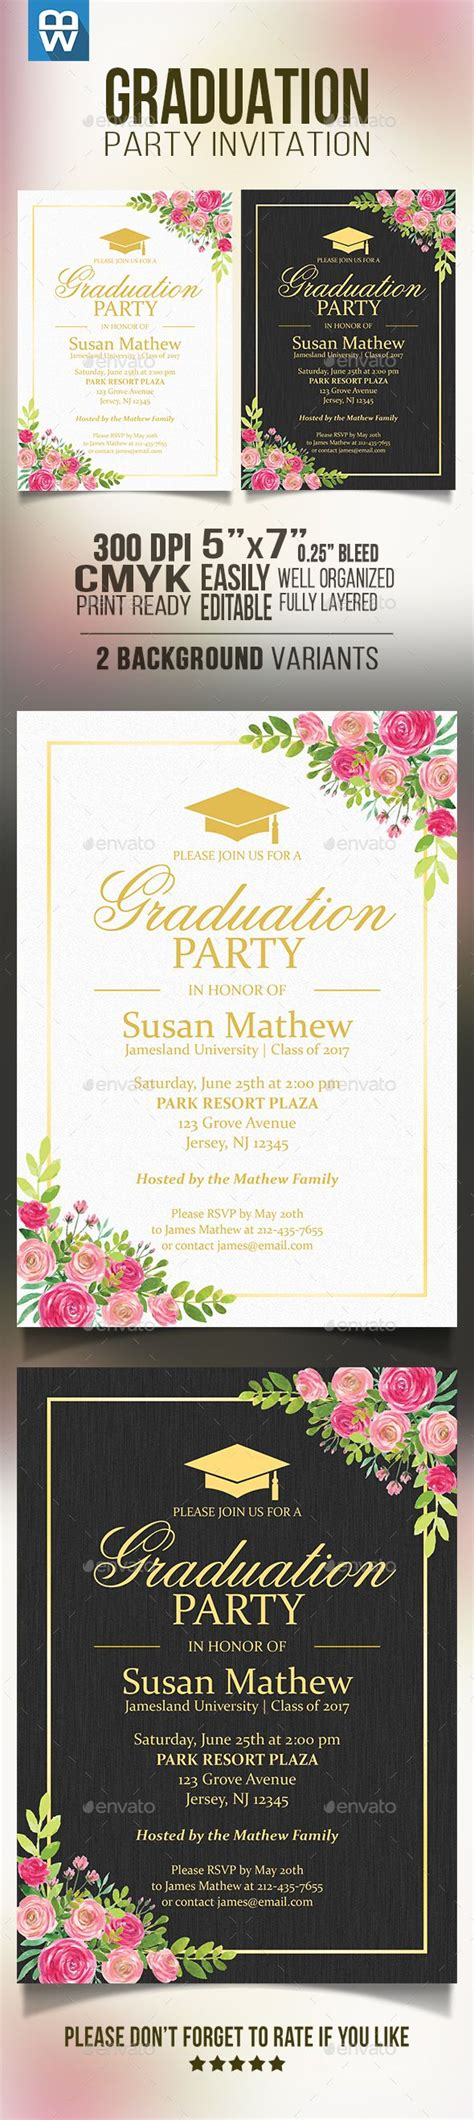 25 Unique Invitation Templates Ideas On Pinterest Free Invitation Templates Birthday Graduation Invitation Templates